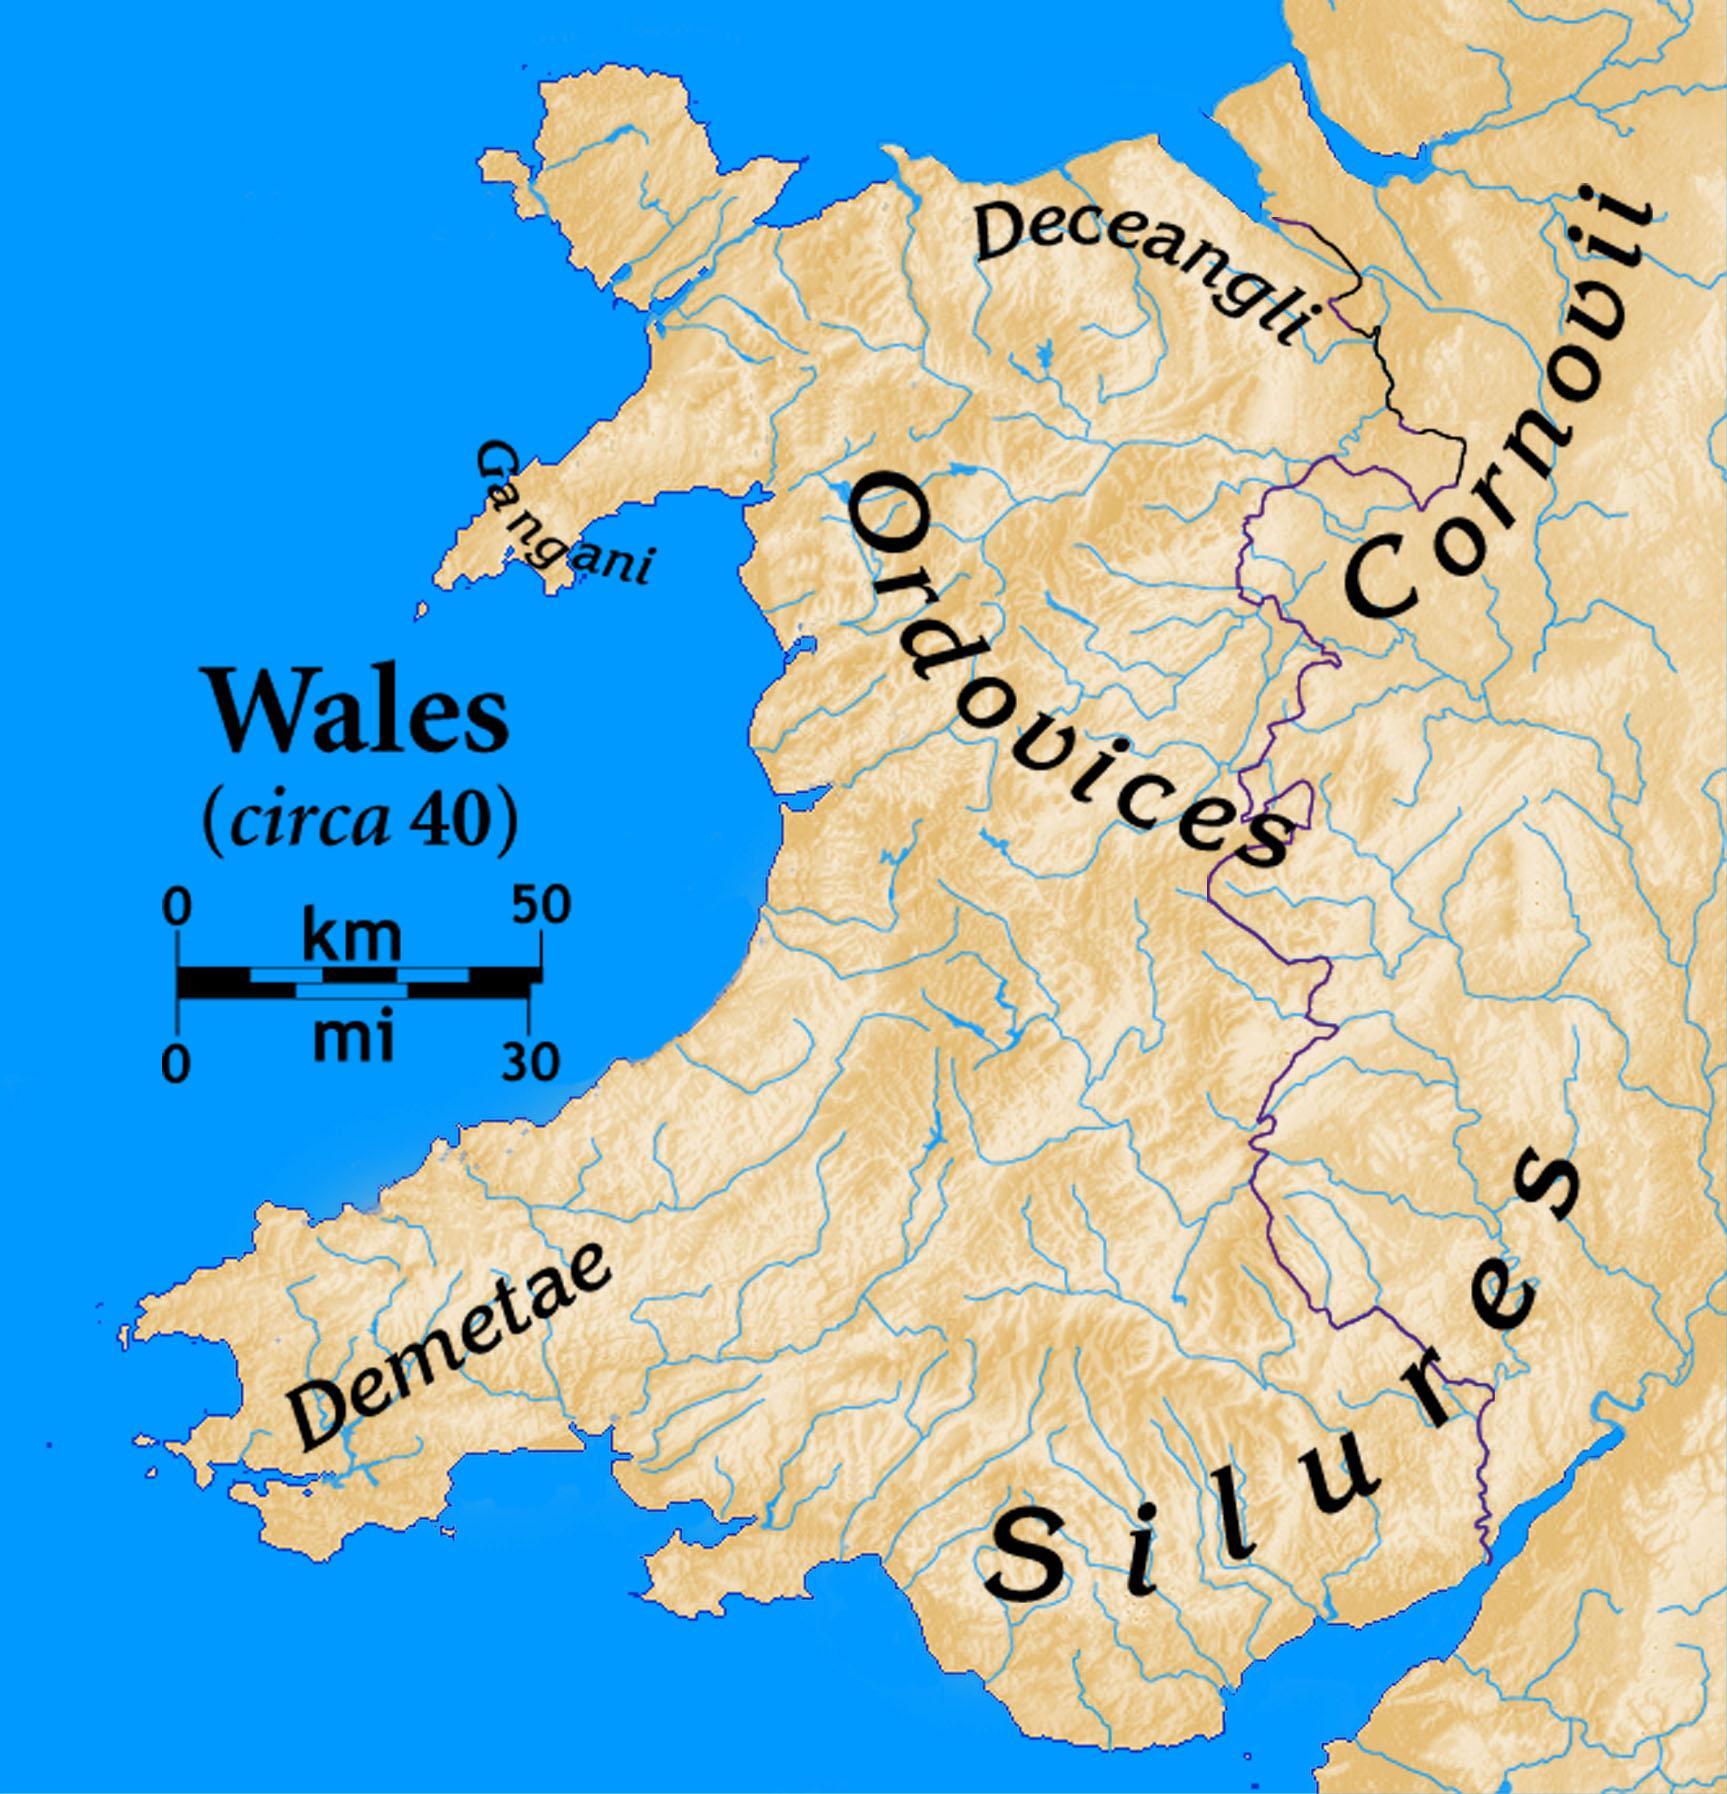 FileWalespreRomanjpg Wikimedia Commons - Where is wales